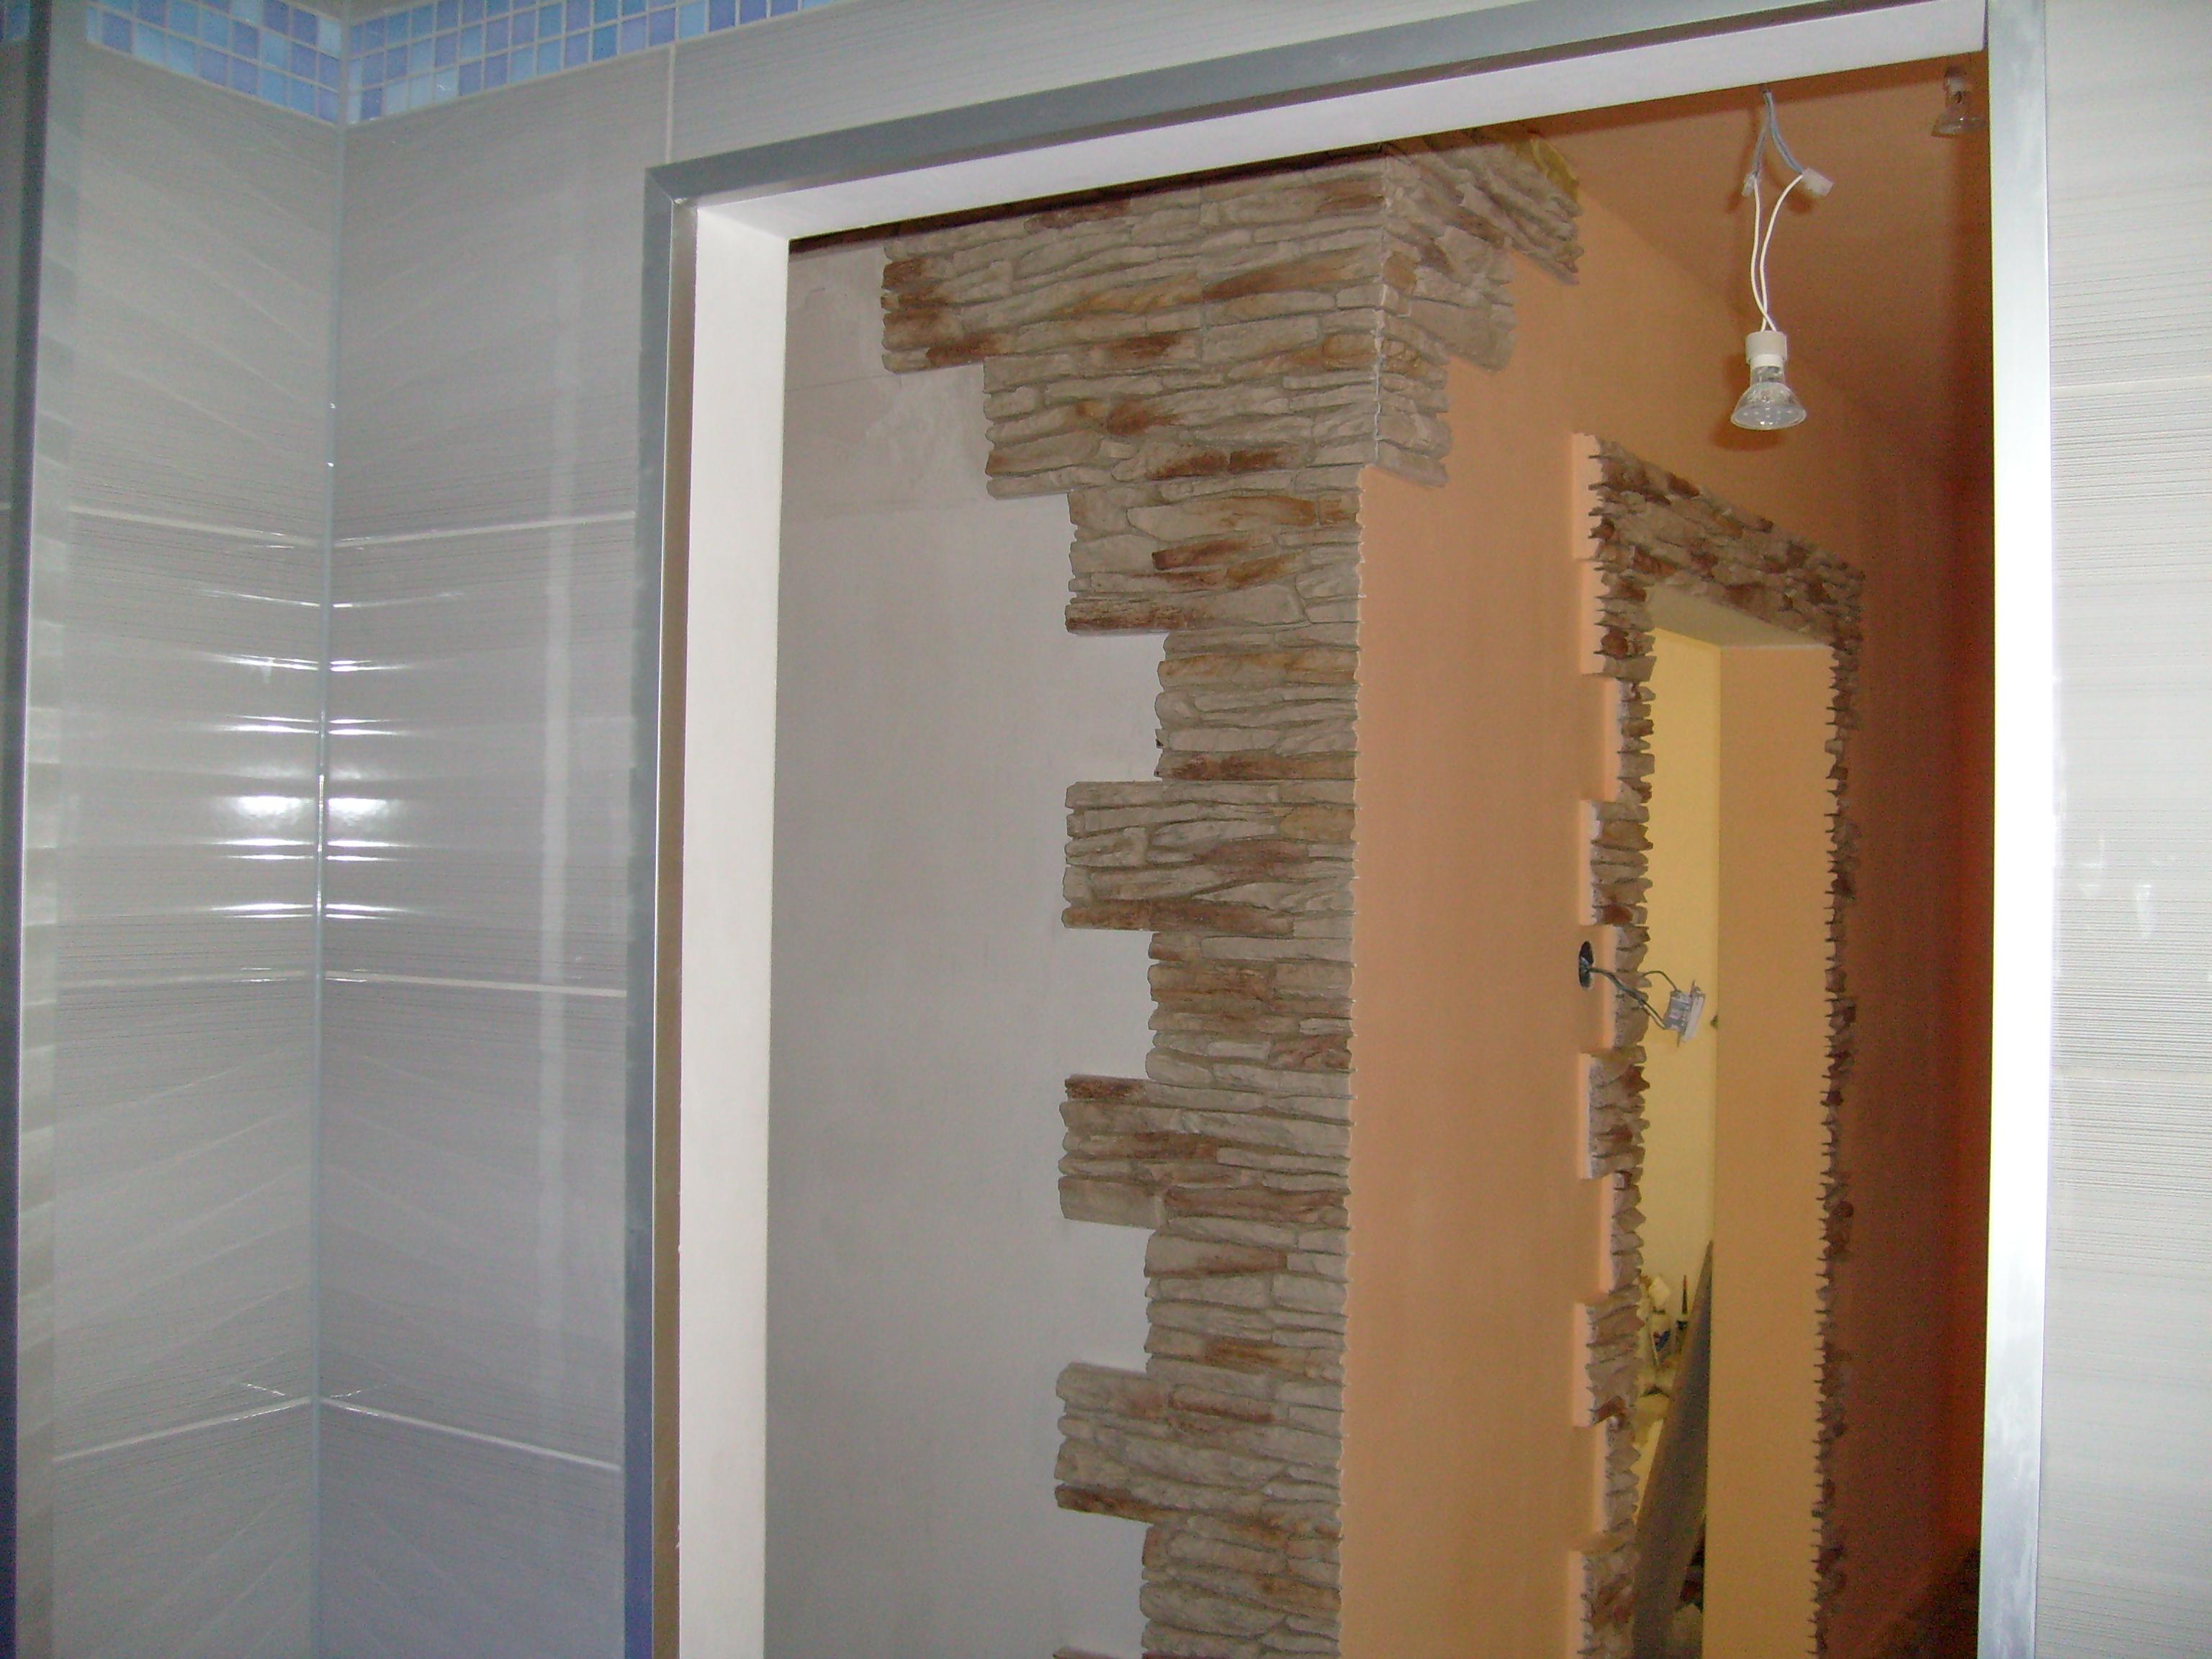 Mieszkanie 2 (11)